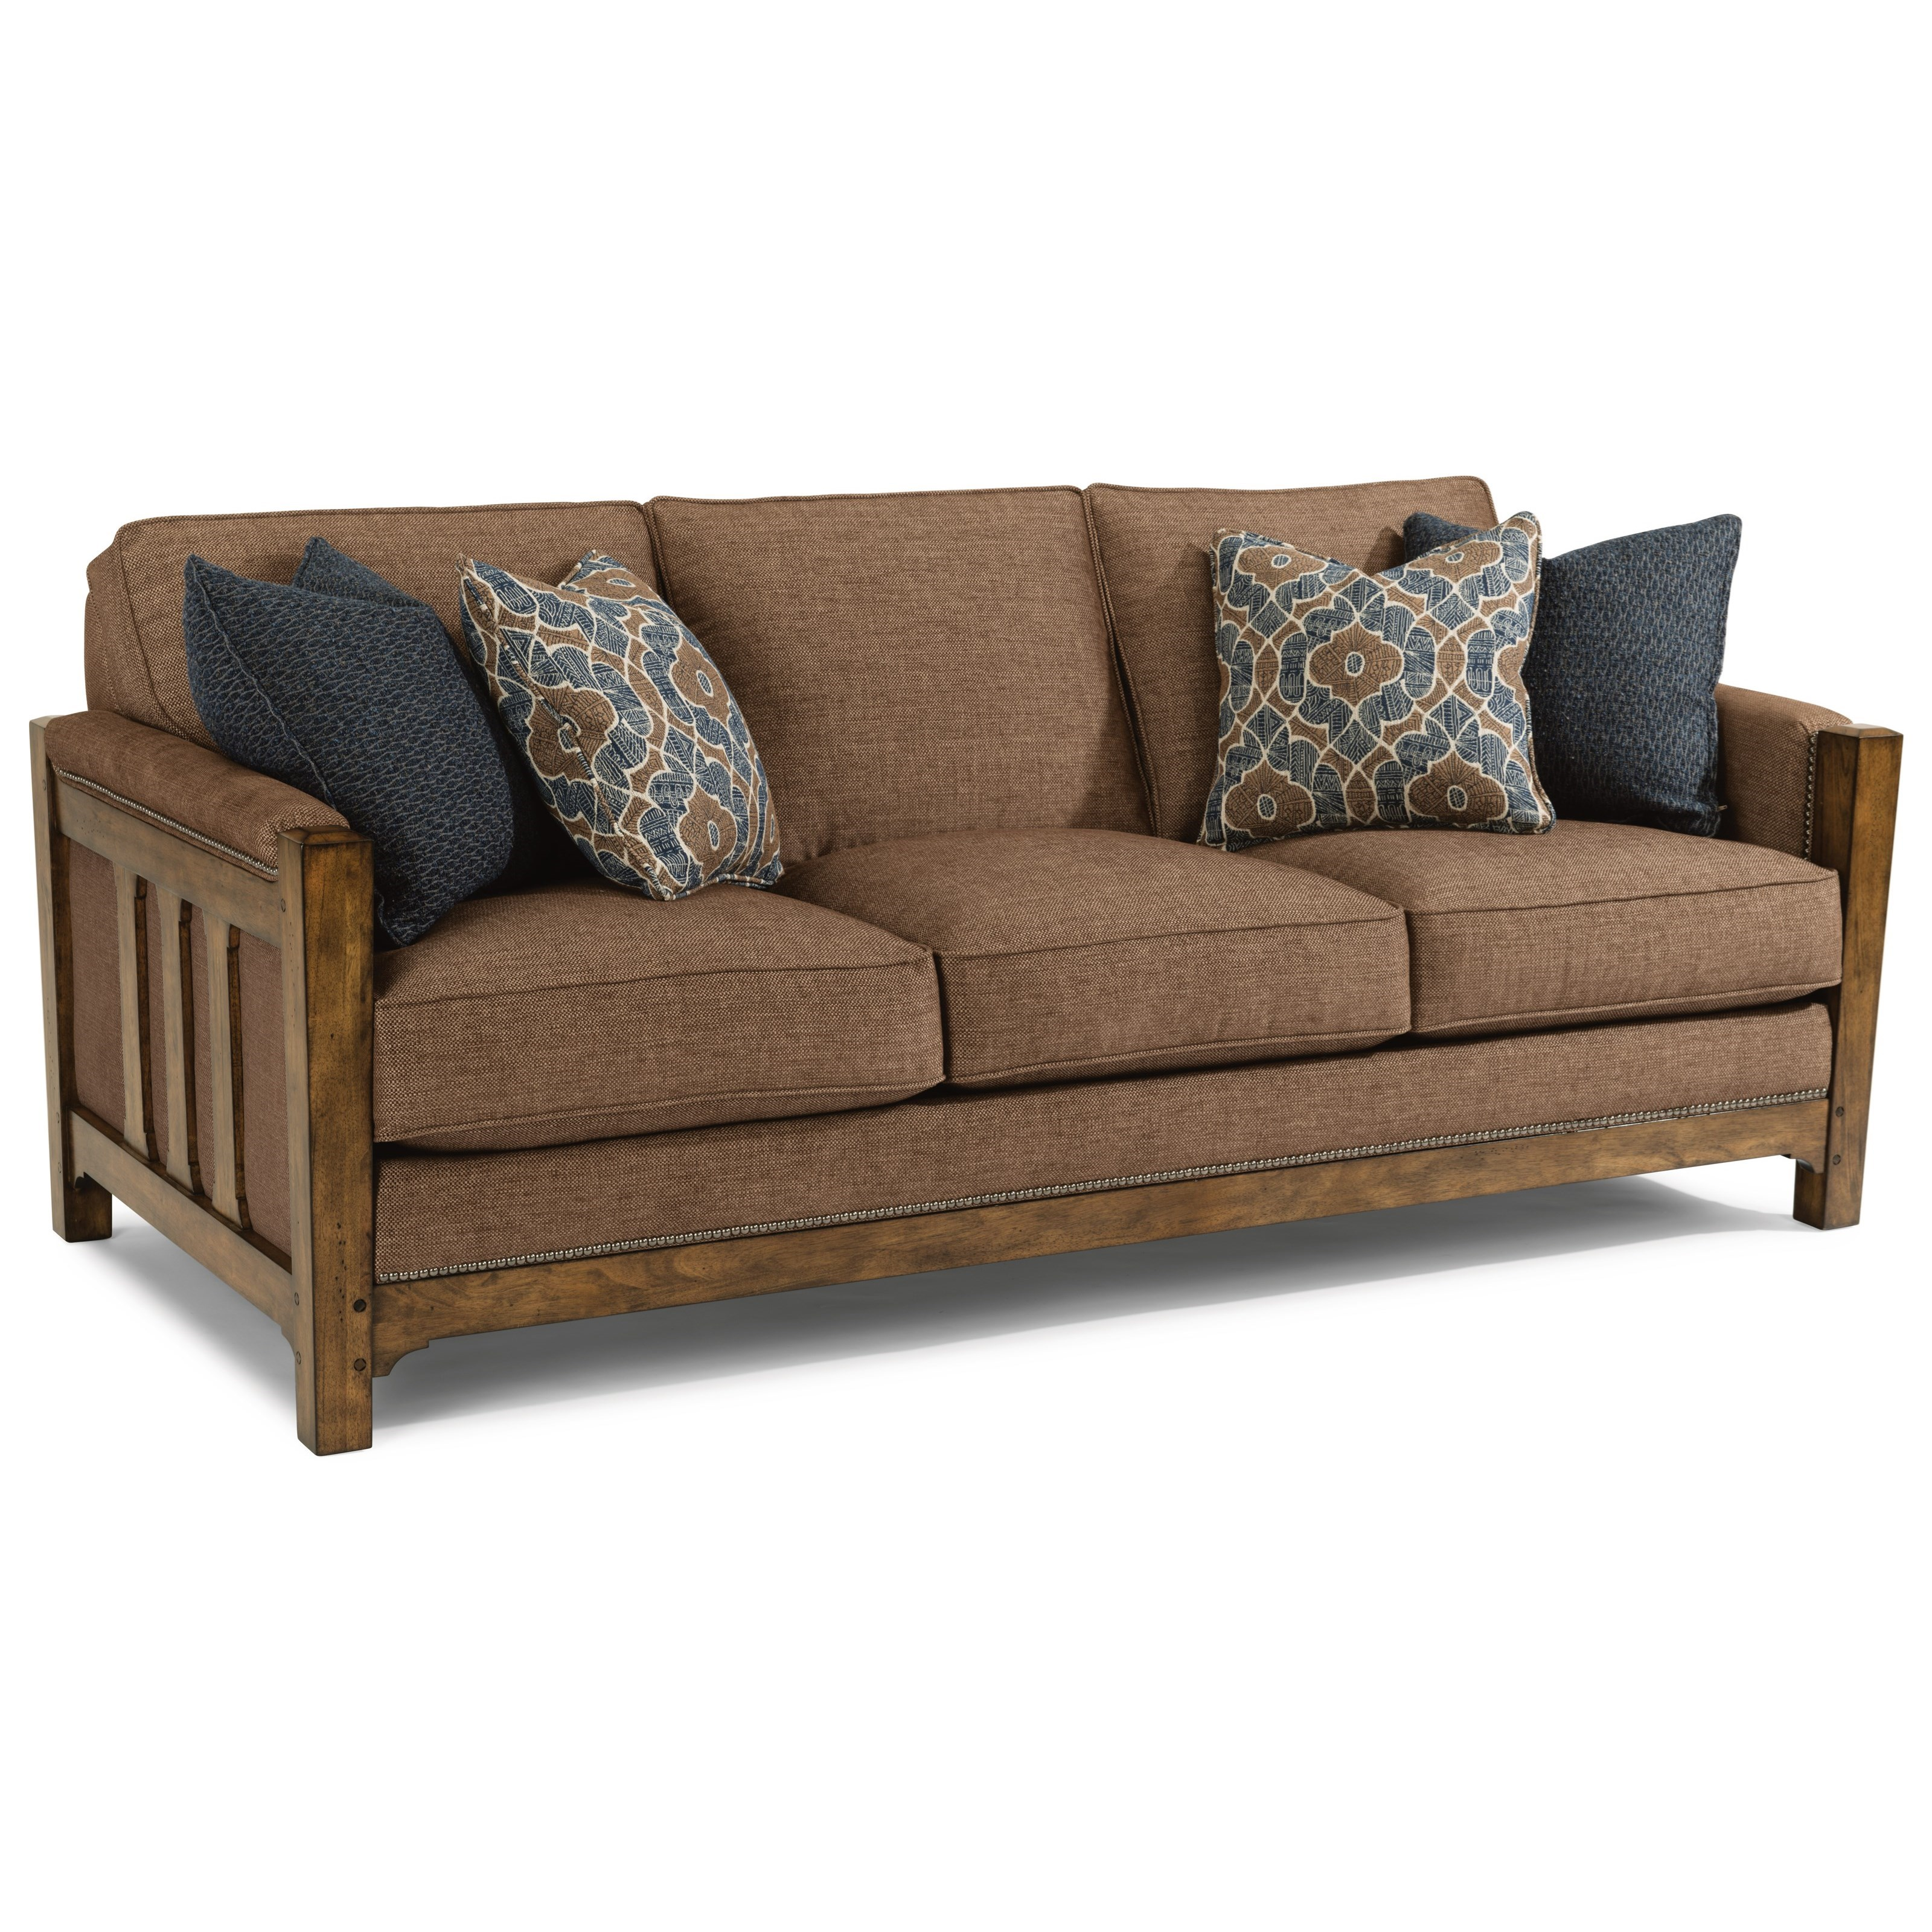 Flexsteel Sonora Sofa   Item Number: 7944 31 324 70